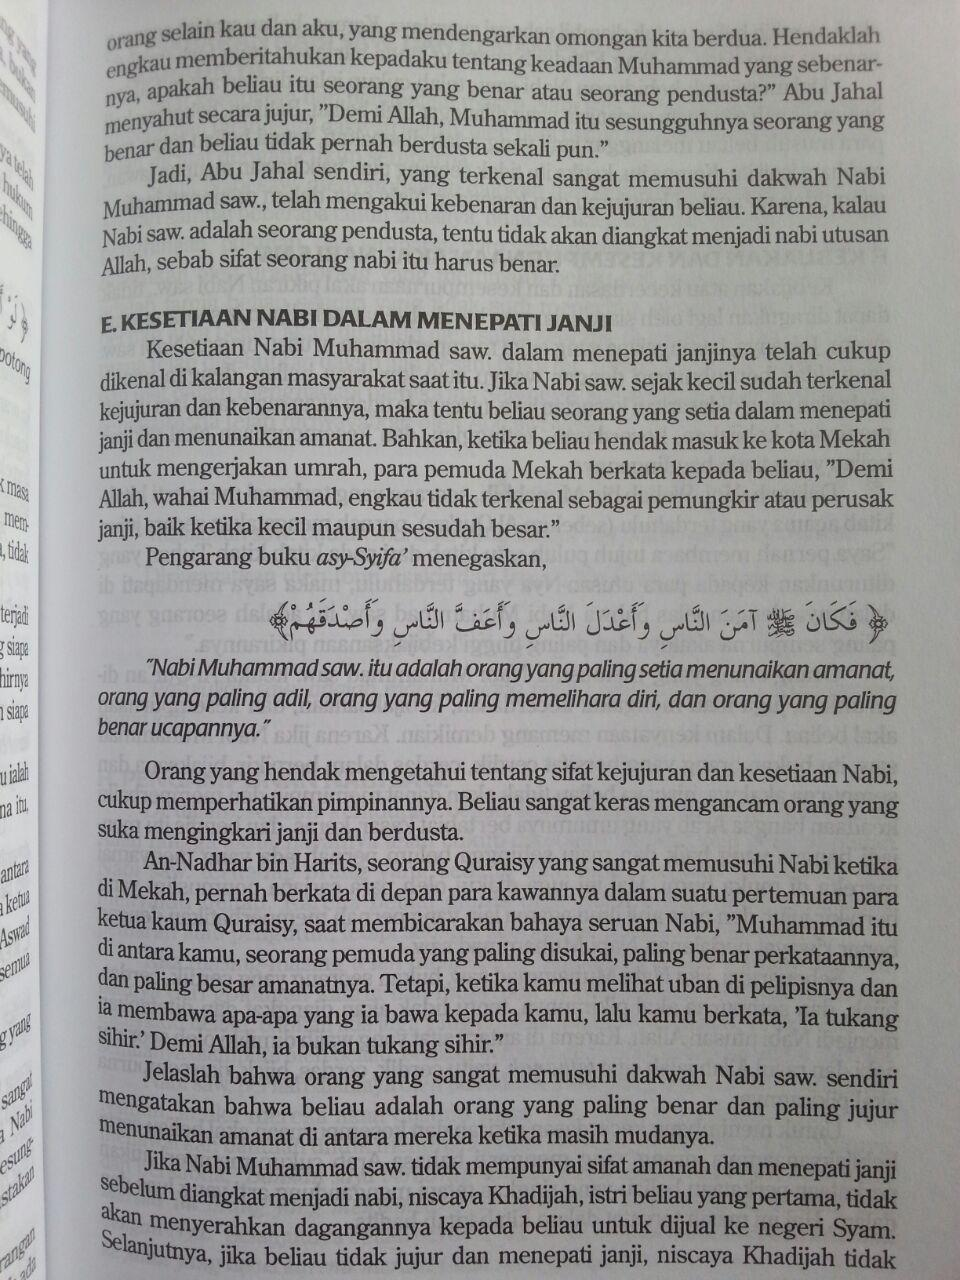 Buku Kelengkapan Tarikh Nabi Muhammad Set 3 Jilid isi